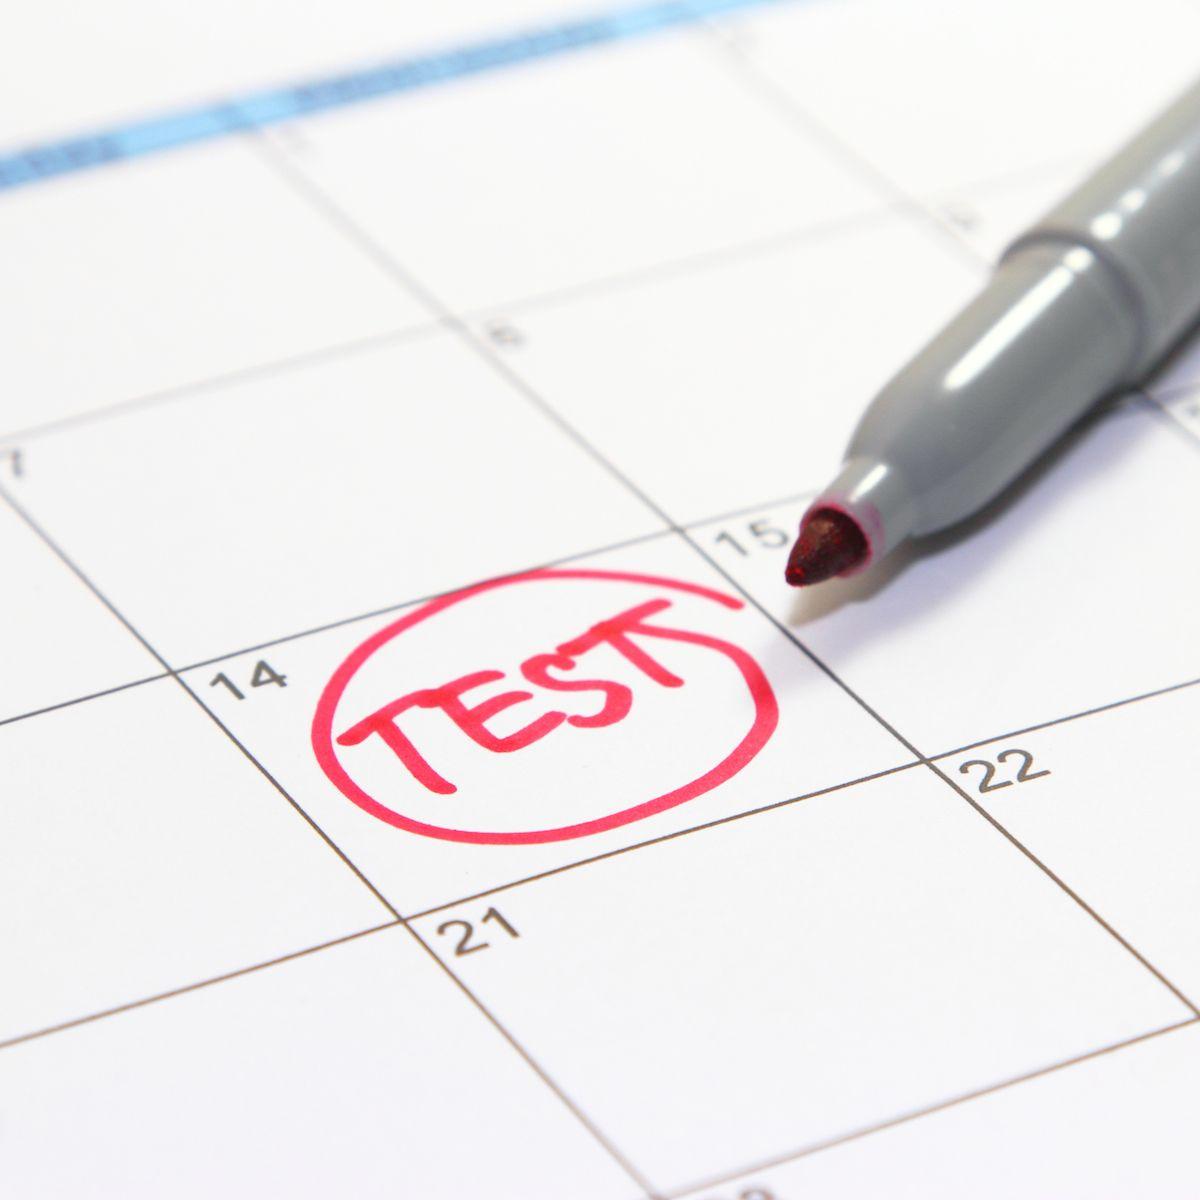 LSAT Study Schedule 3 Month LSAT Prep Study Guide Study